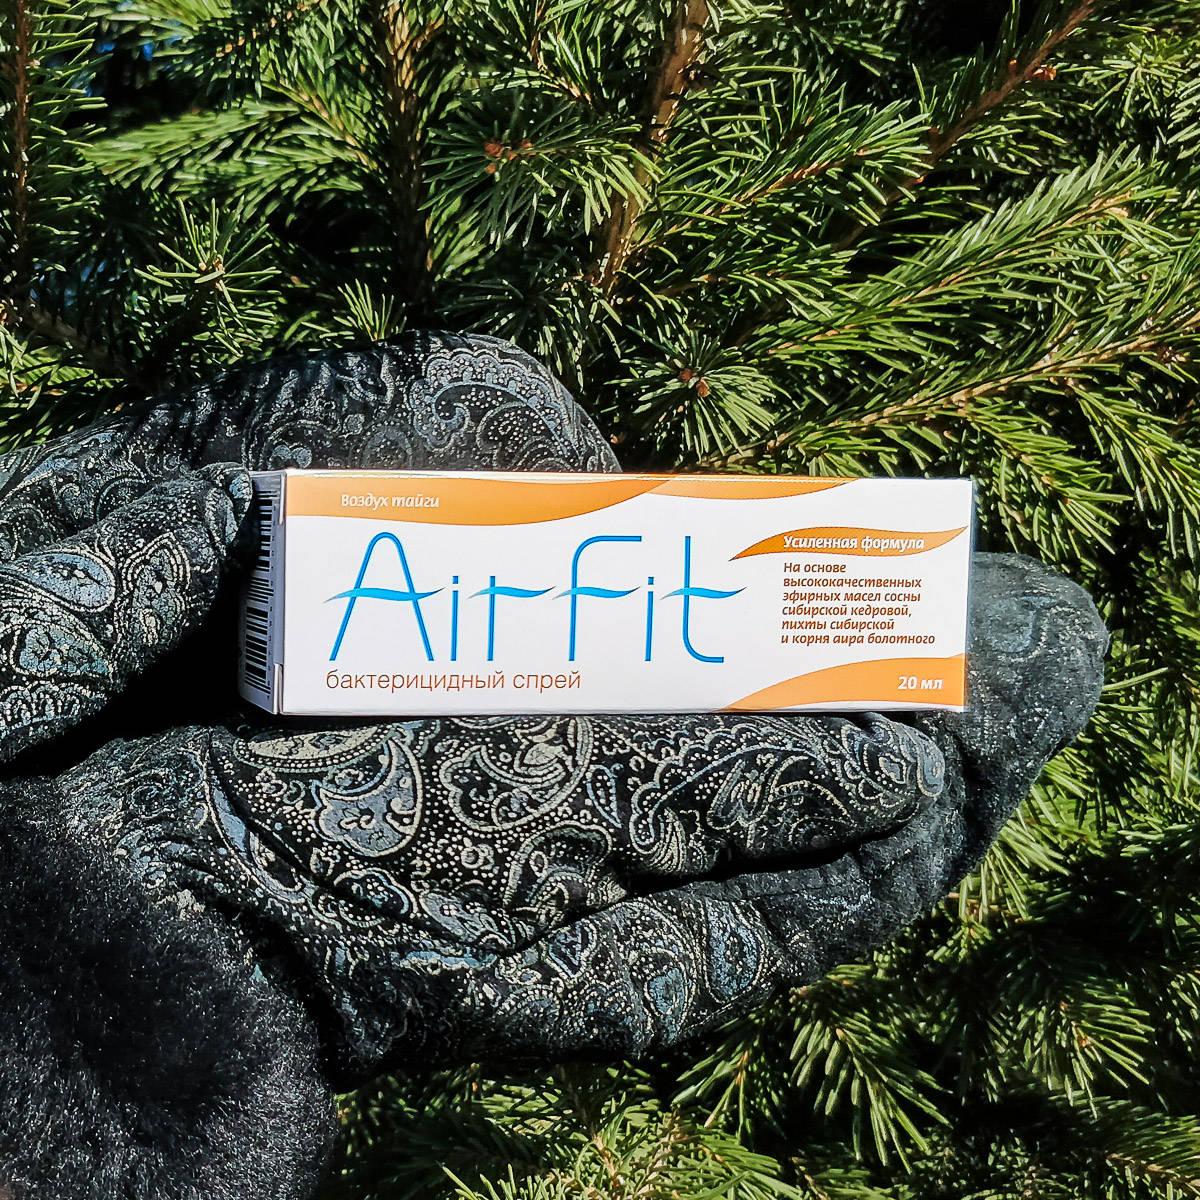 Бактерицидный спрей AirFit 20 мл (кедр + пихта + аир болотный)